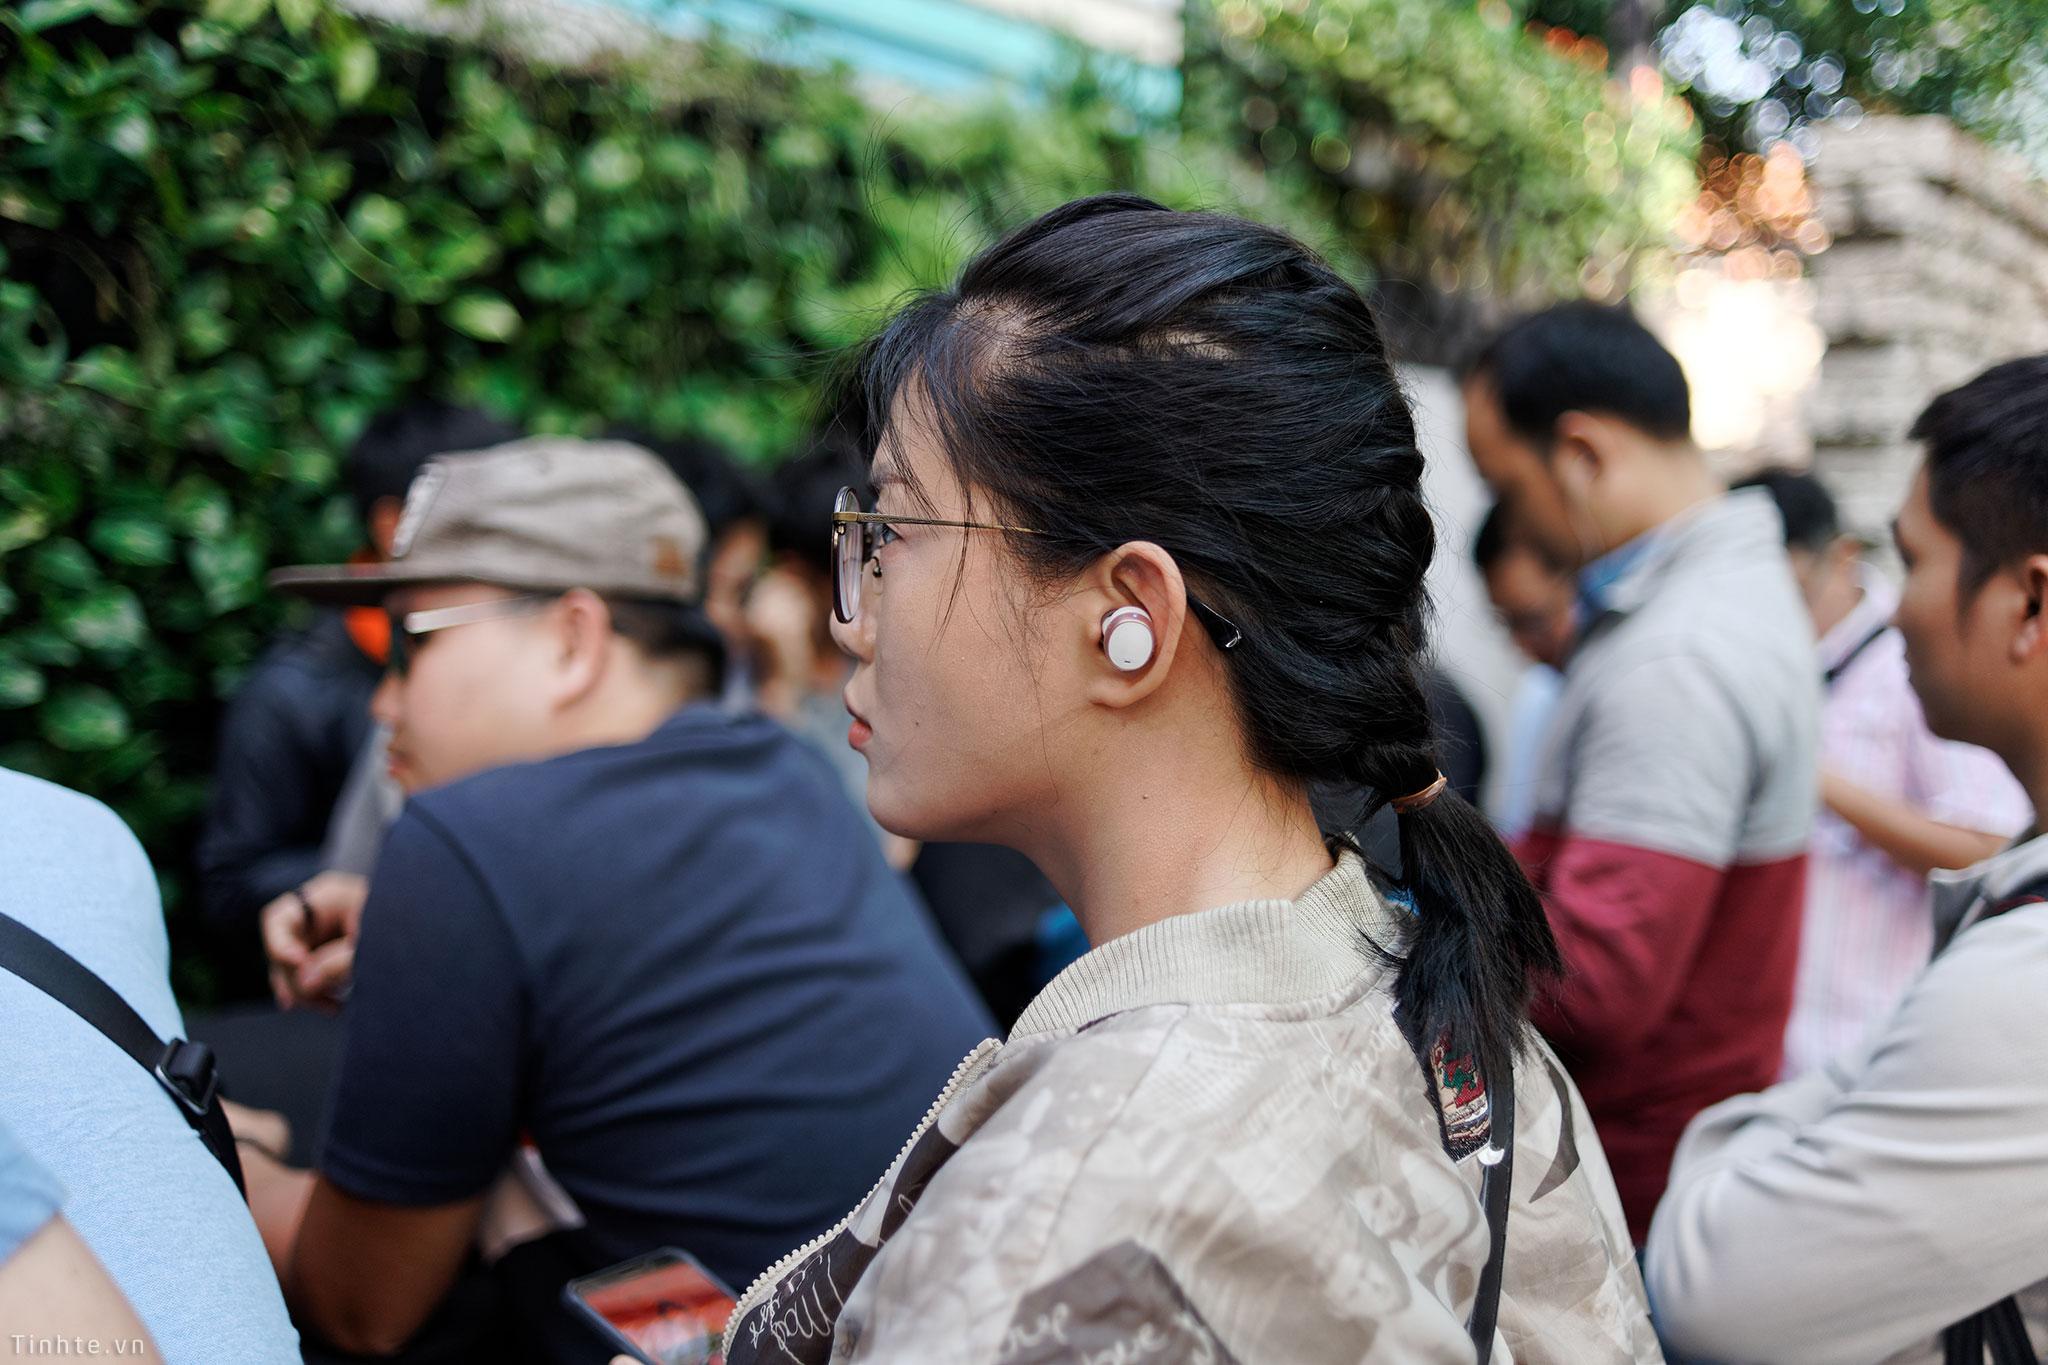 tinhte_true_wireless_headphones_offline_2018_3.jpg